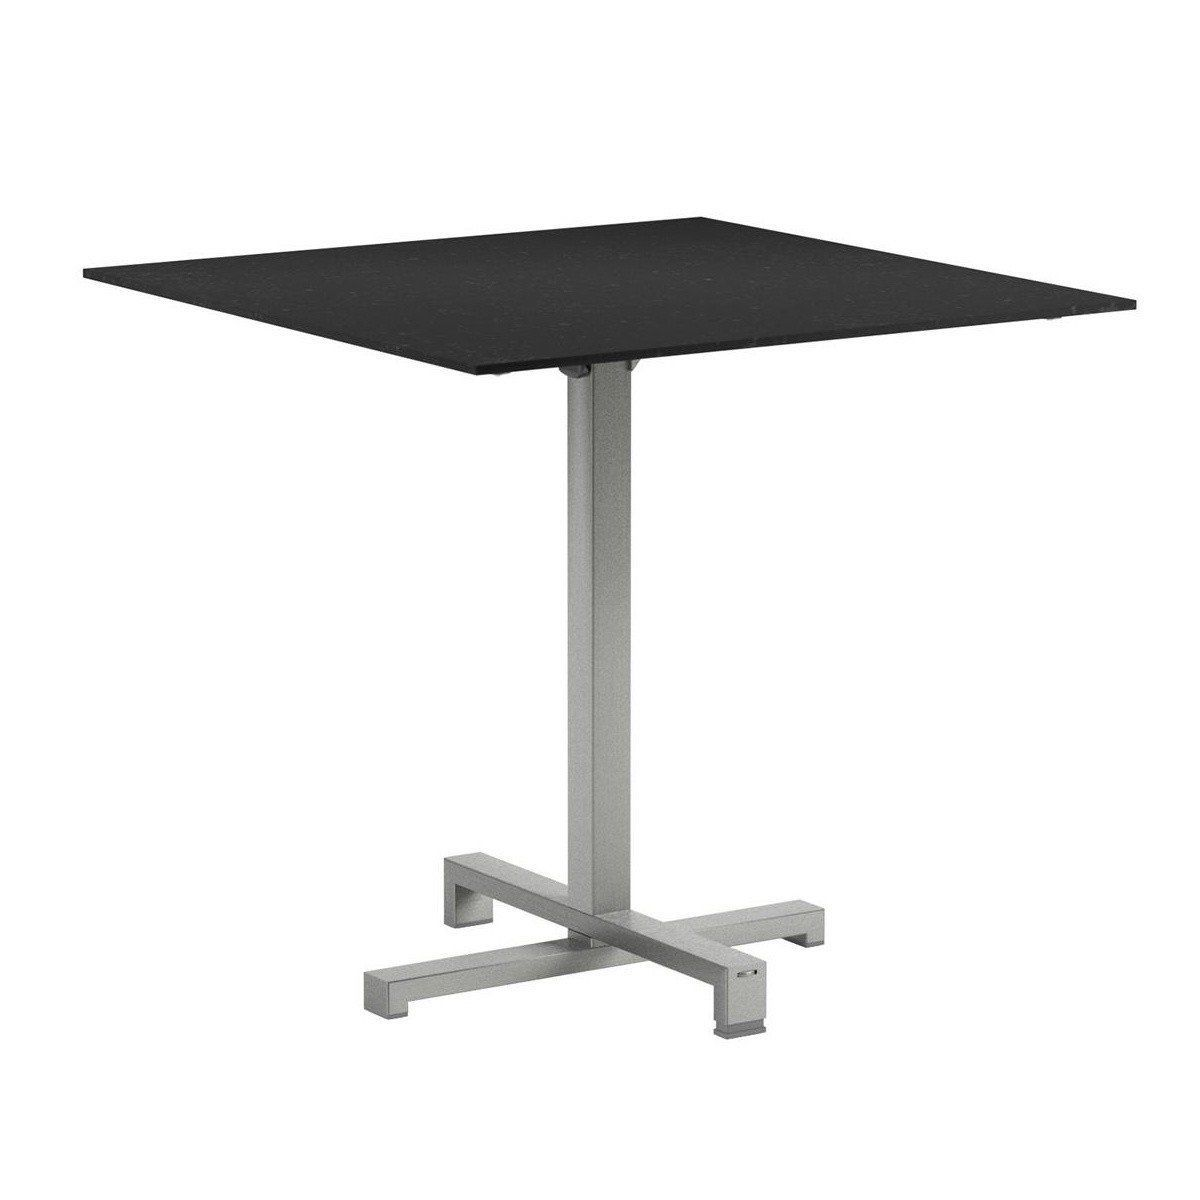 ... Royal Botania   Taboela Folding Table Frame Stainless Steel    Black/glass/LxWxH 80x80x75cm ...